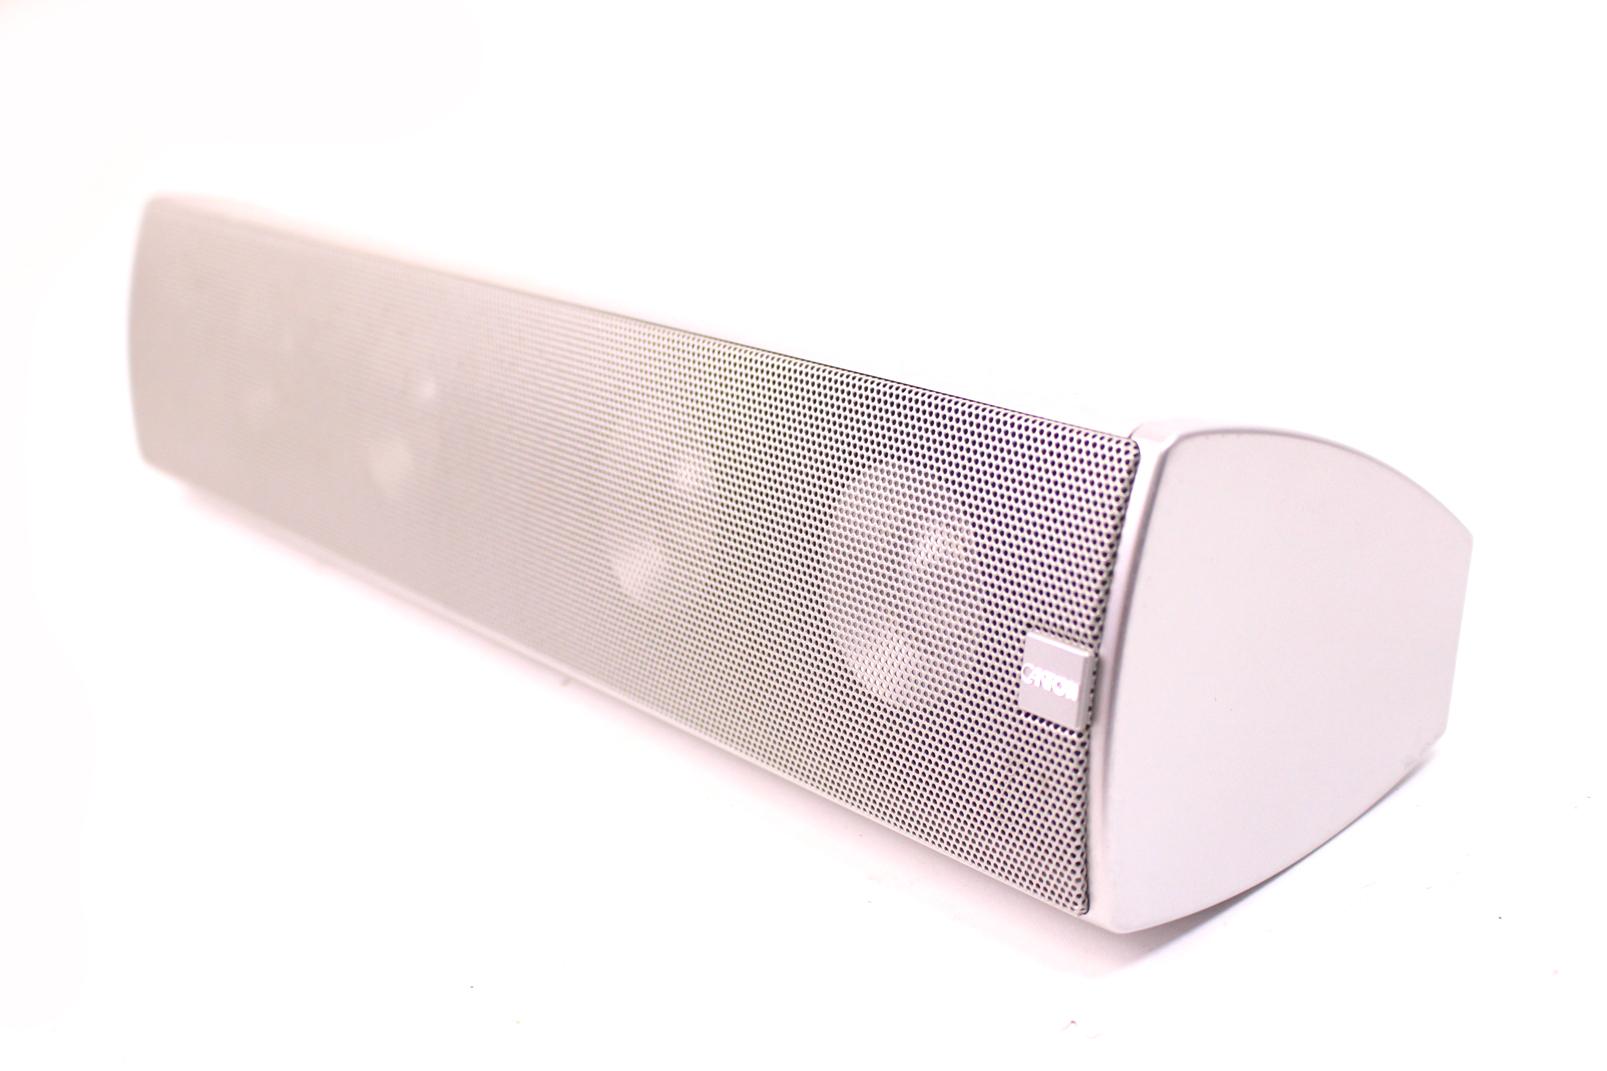 canton cd 50 center lautsprecher 100 w centerspeaker. Black Bedroom Furniture Sets. Home Design Ideas